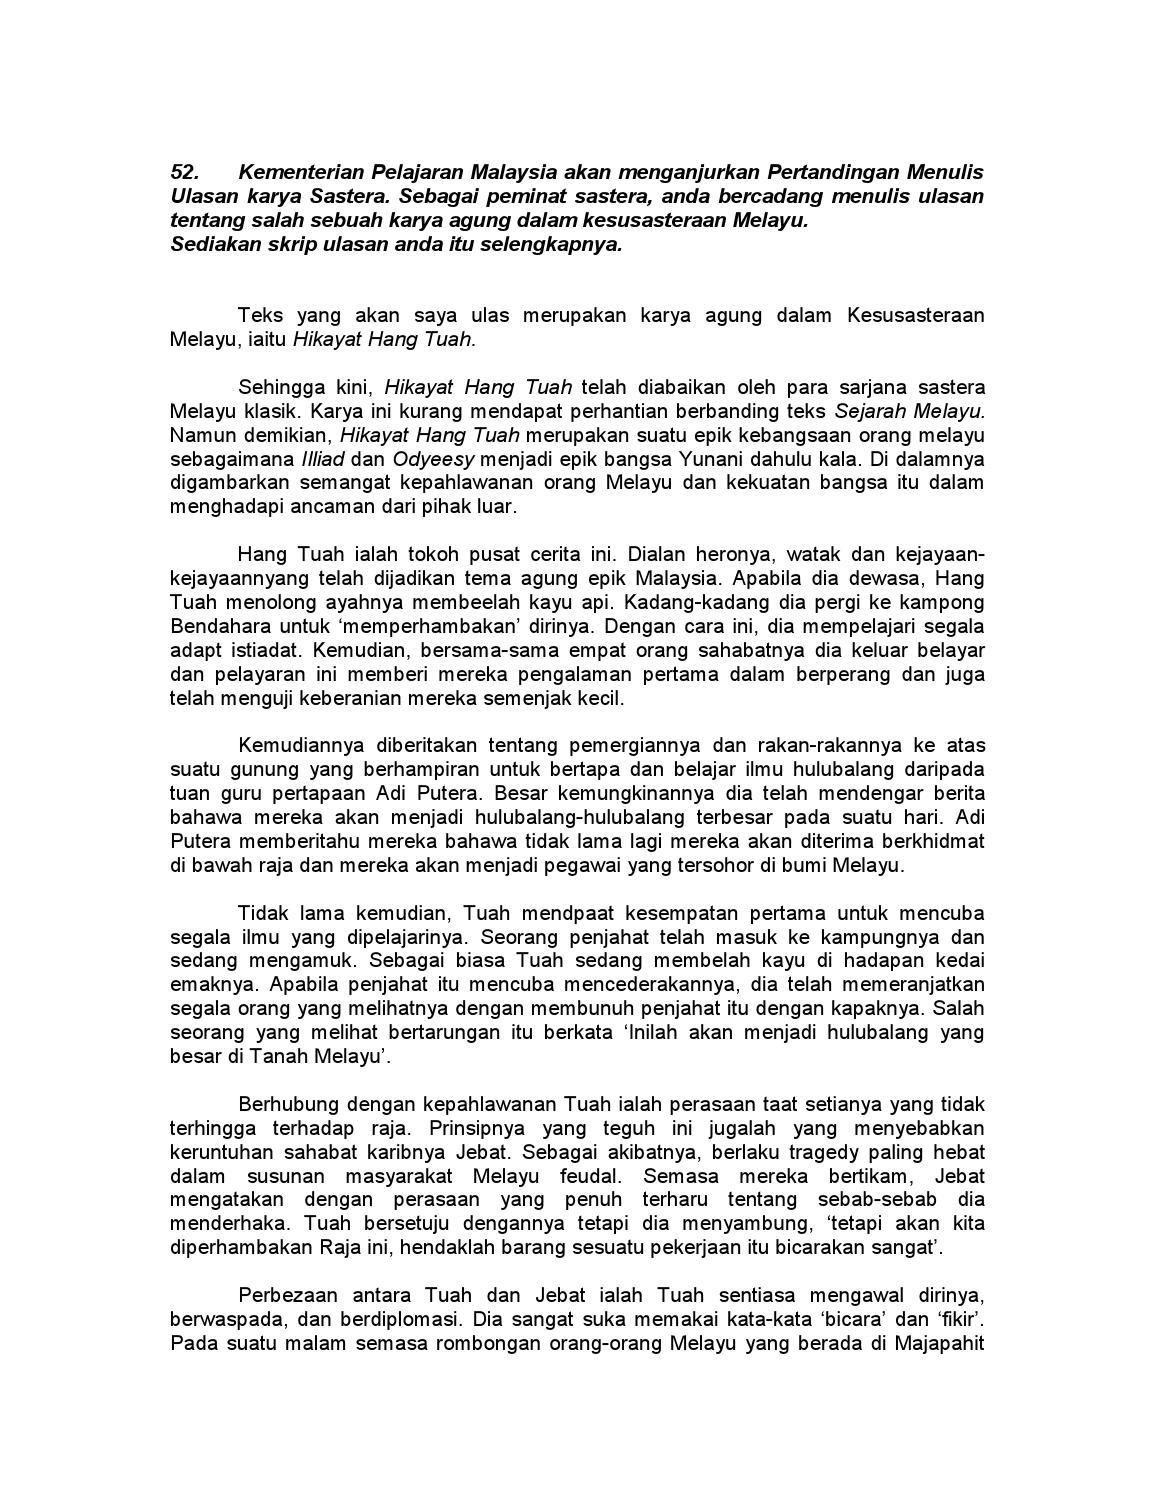 100 Karangan Contoh Pmr Dan Spm By Zaiton Zaba Issuu